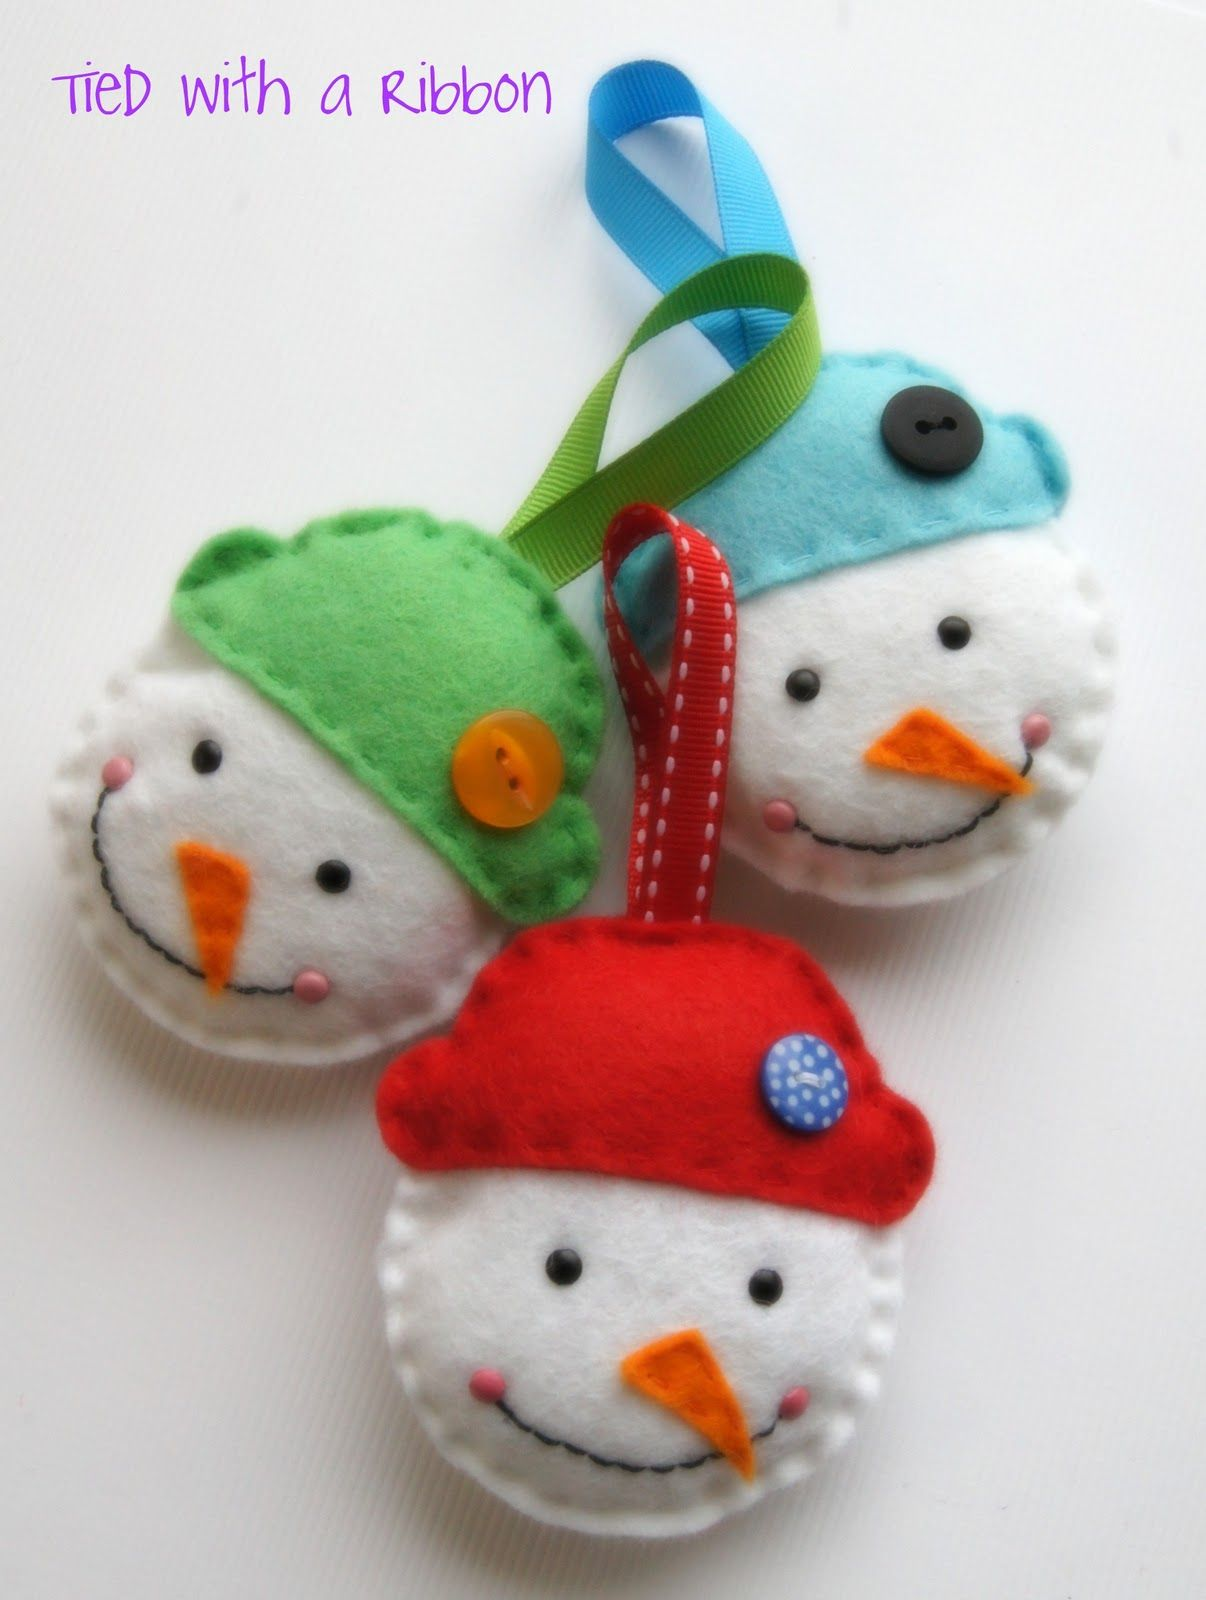 Tied With A Ribbon Snowman Tutorial Diy Felt Christmas Ornaments Felt Christmas Felt Christmas Ornaments